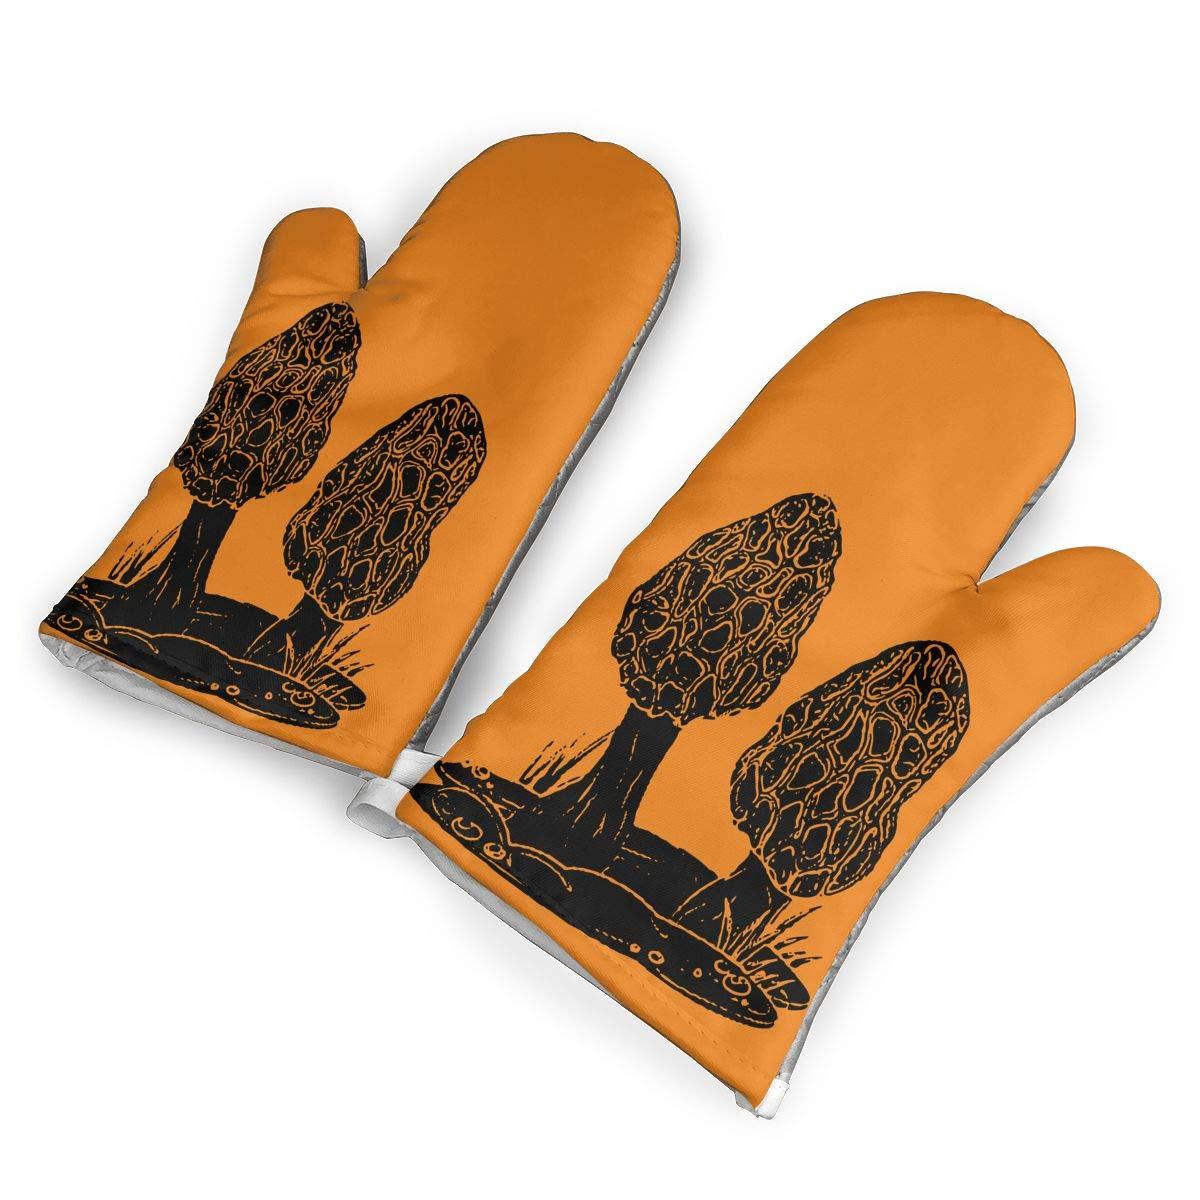 Mushroom Hunter Morel Mushroom Farming Oven Gloves,Non-Slip Easy to Use Oven Mitts for Cooking,1Pair